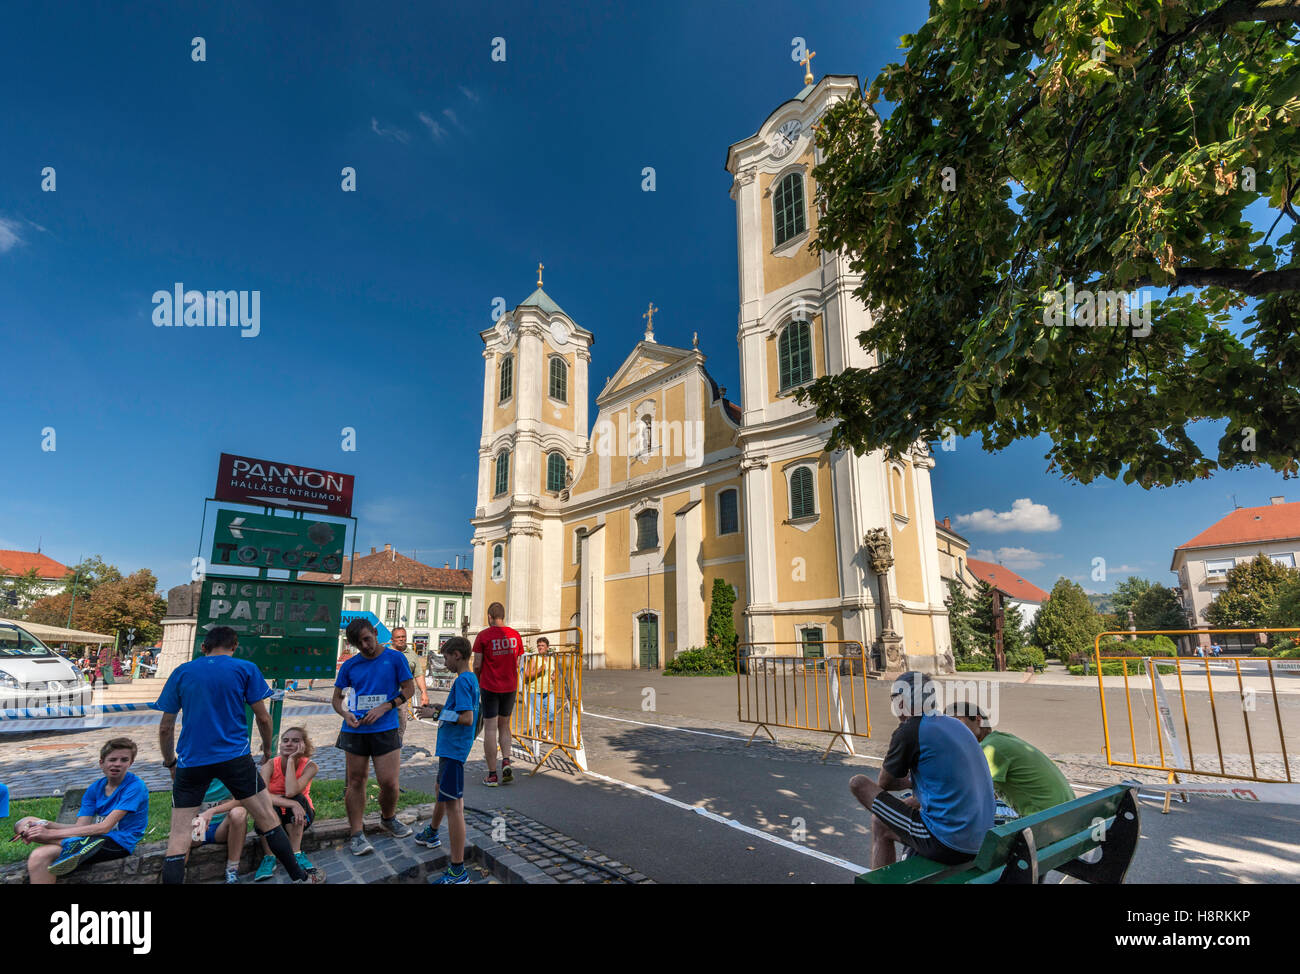 Saint Bartholomew Church, Baroque style, in Gyongyos, Hungary - Stock Image